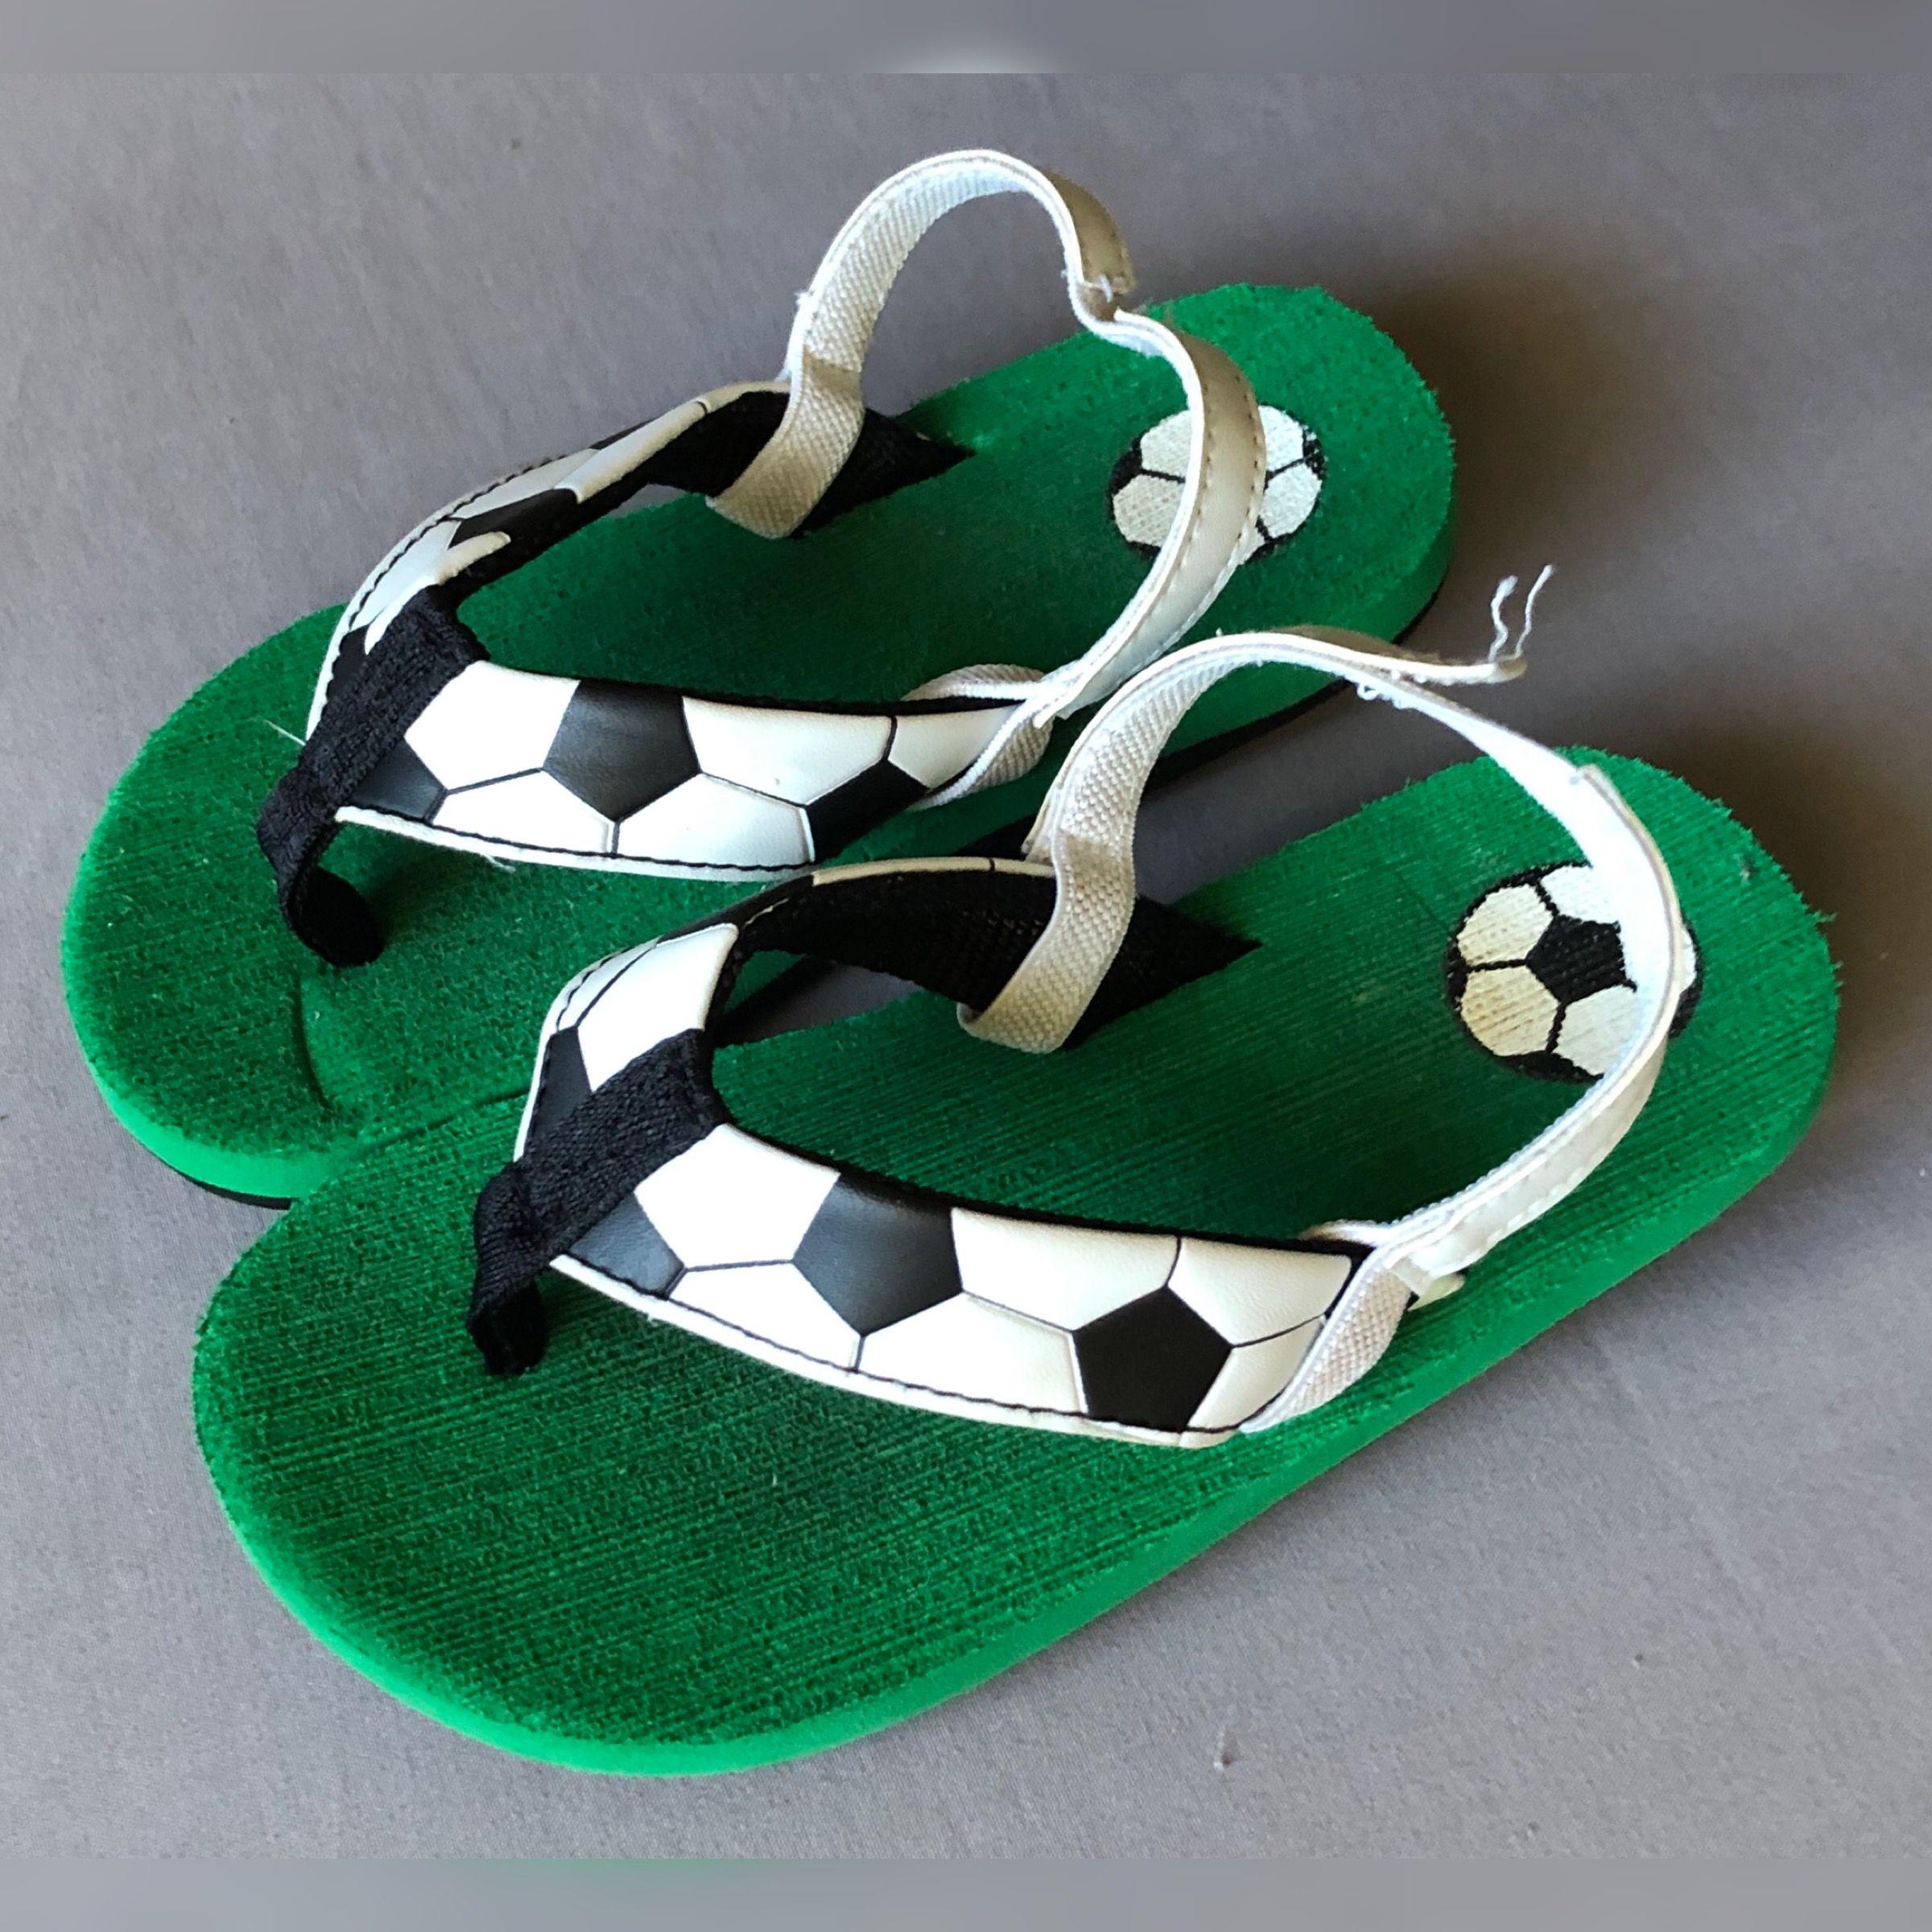 8beeb8c5a Toddler Boy's Soccer Flip-Flops | Raquel's Repeats | Christmas ...